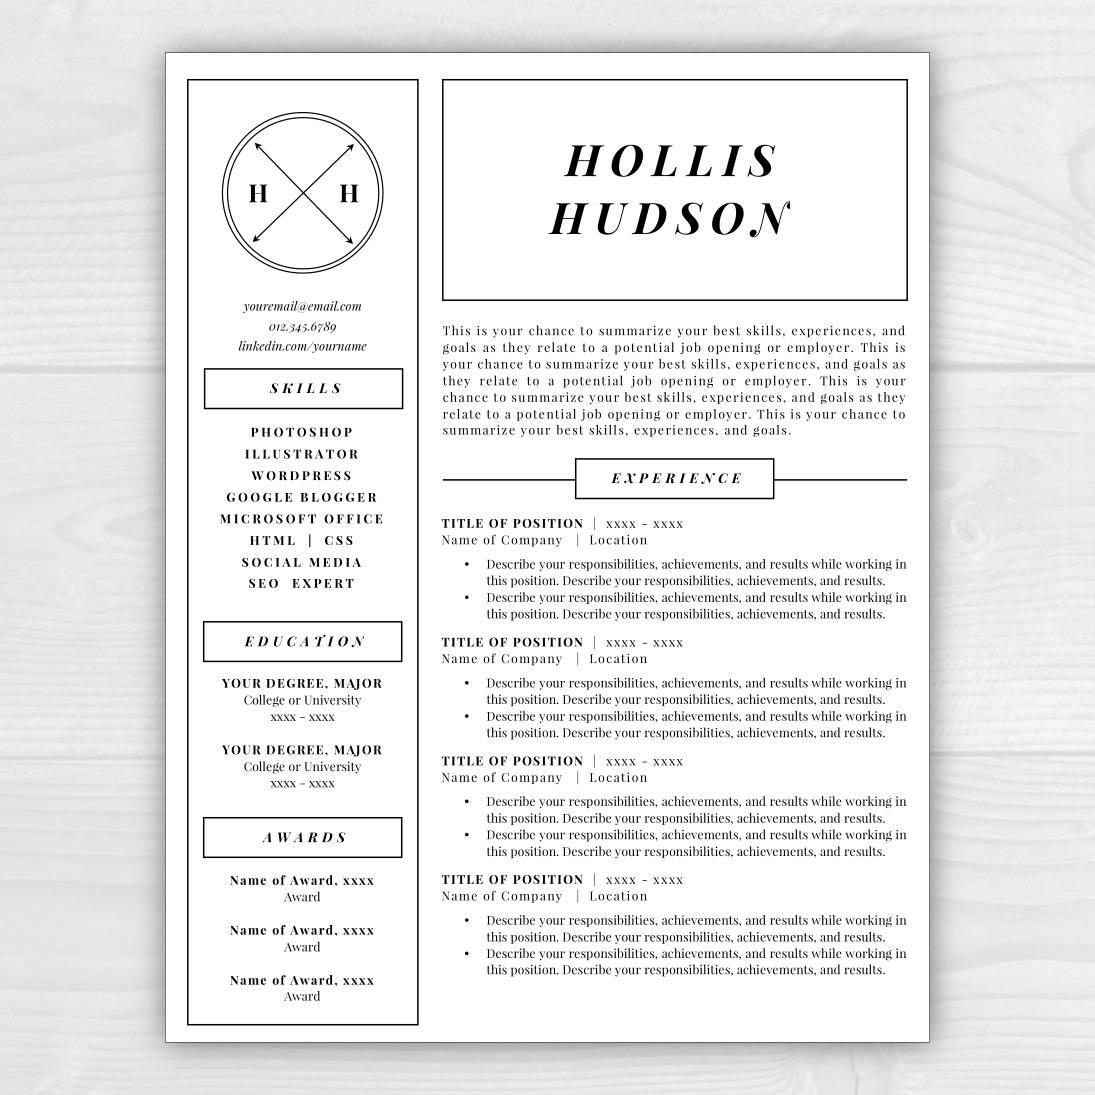 monogram resume template professional resume free resume. Black Bedroom Furniture Sets. Home Design Ideas